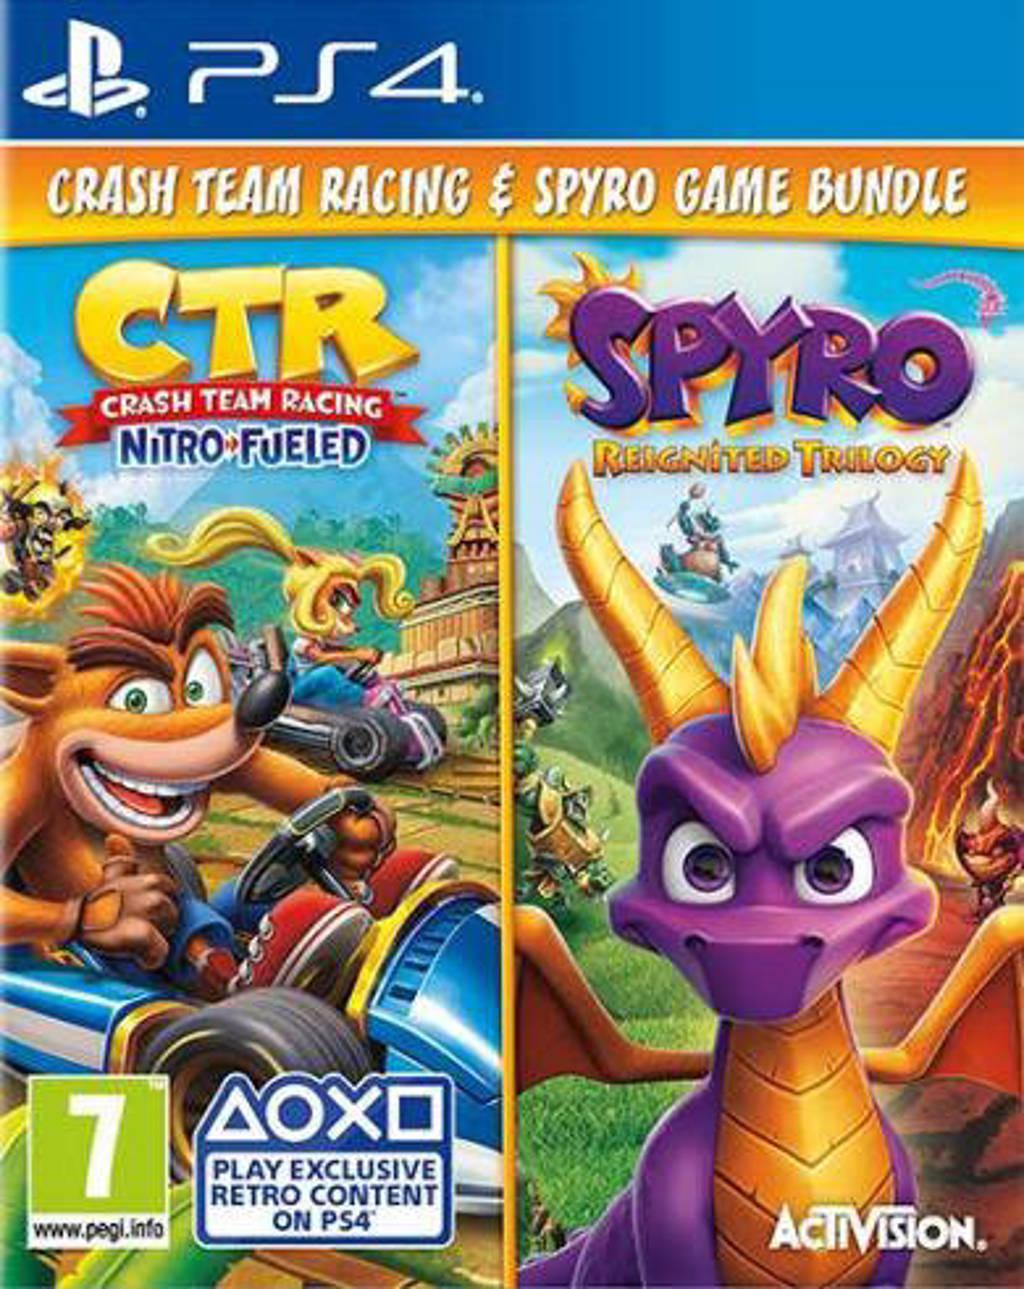 Bundle Crash team racing / Spyro trilogy (PlayStation 4)